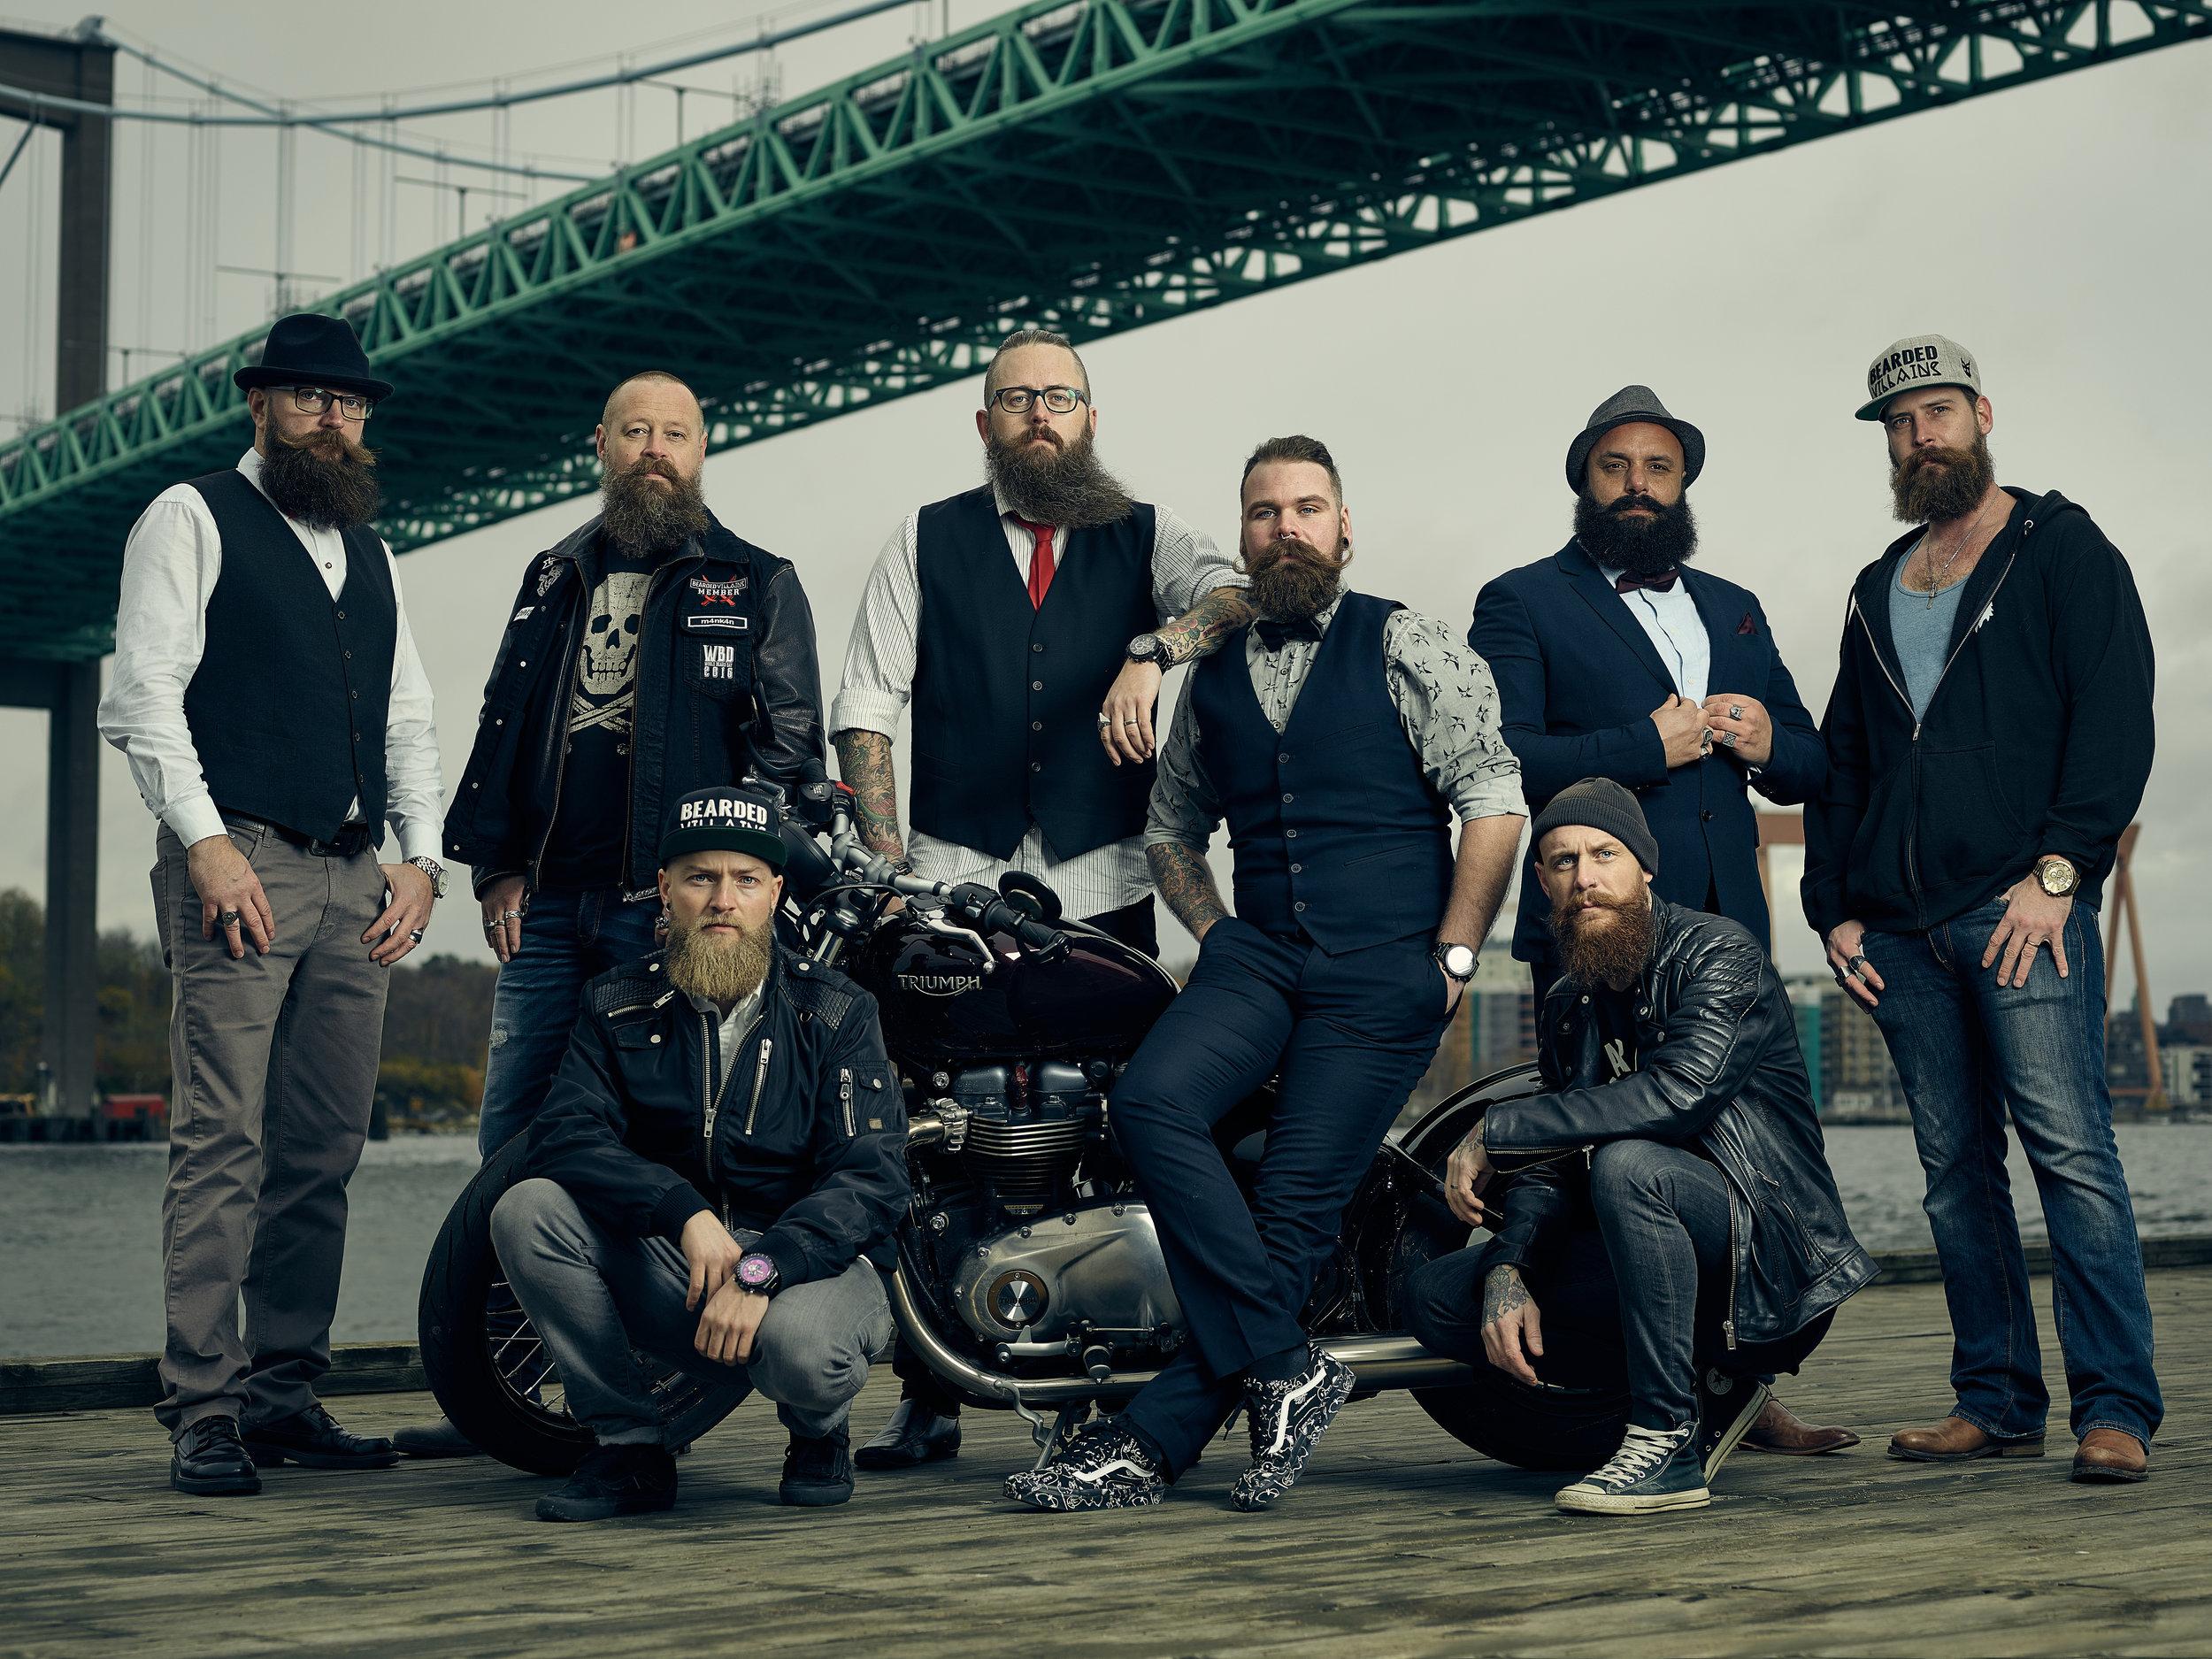 The Beards of Gothenburg